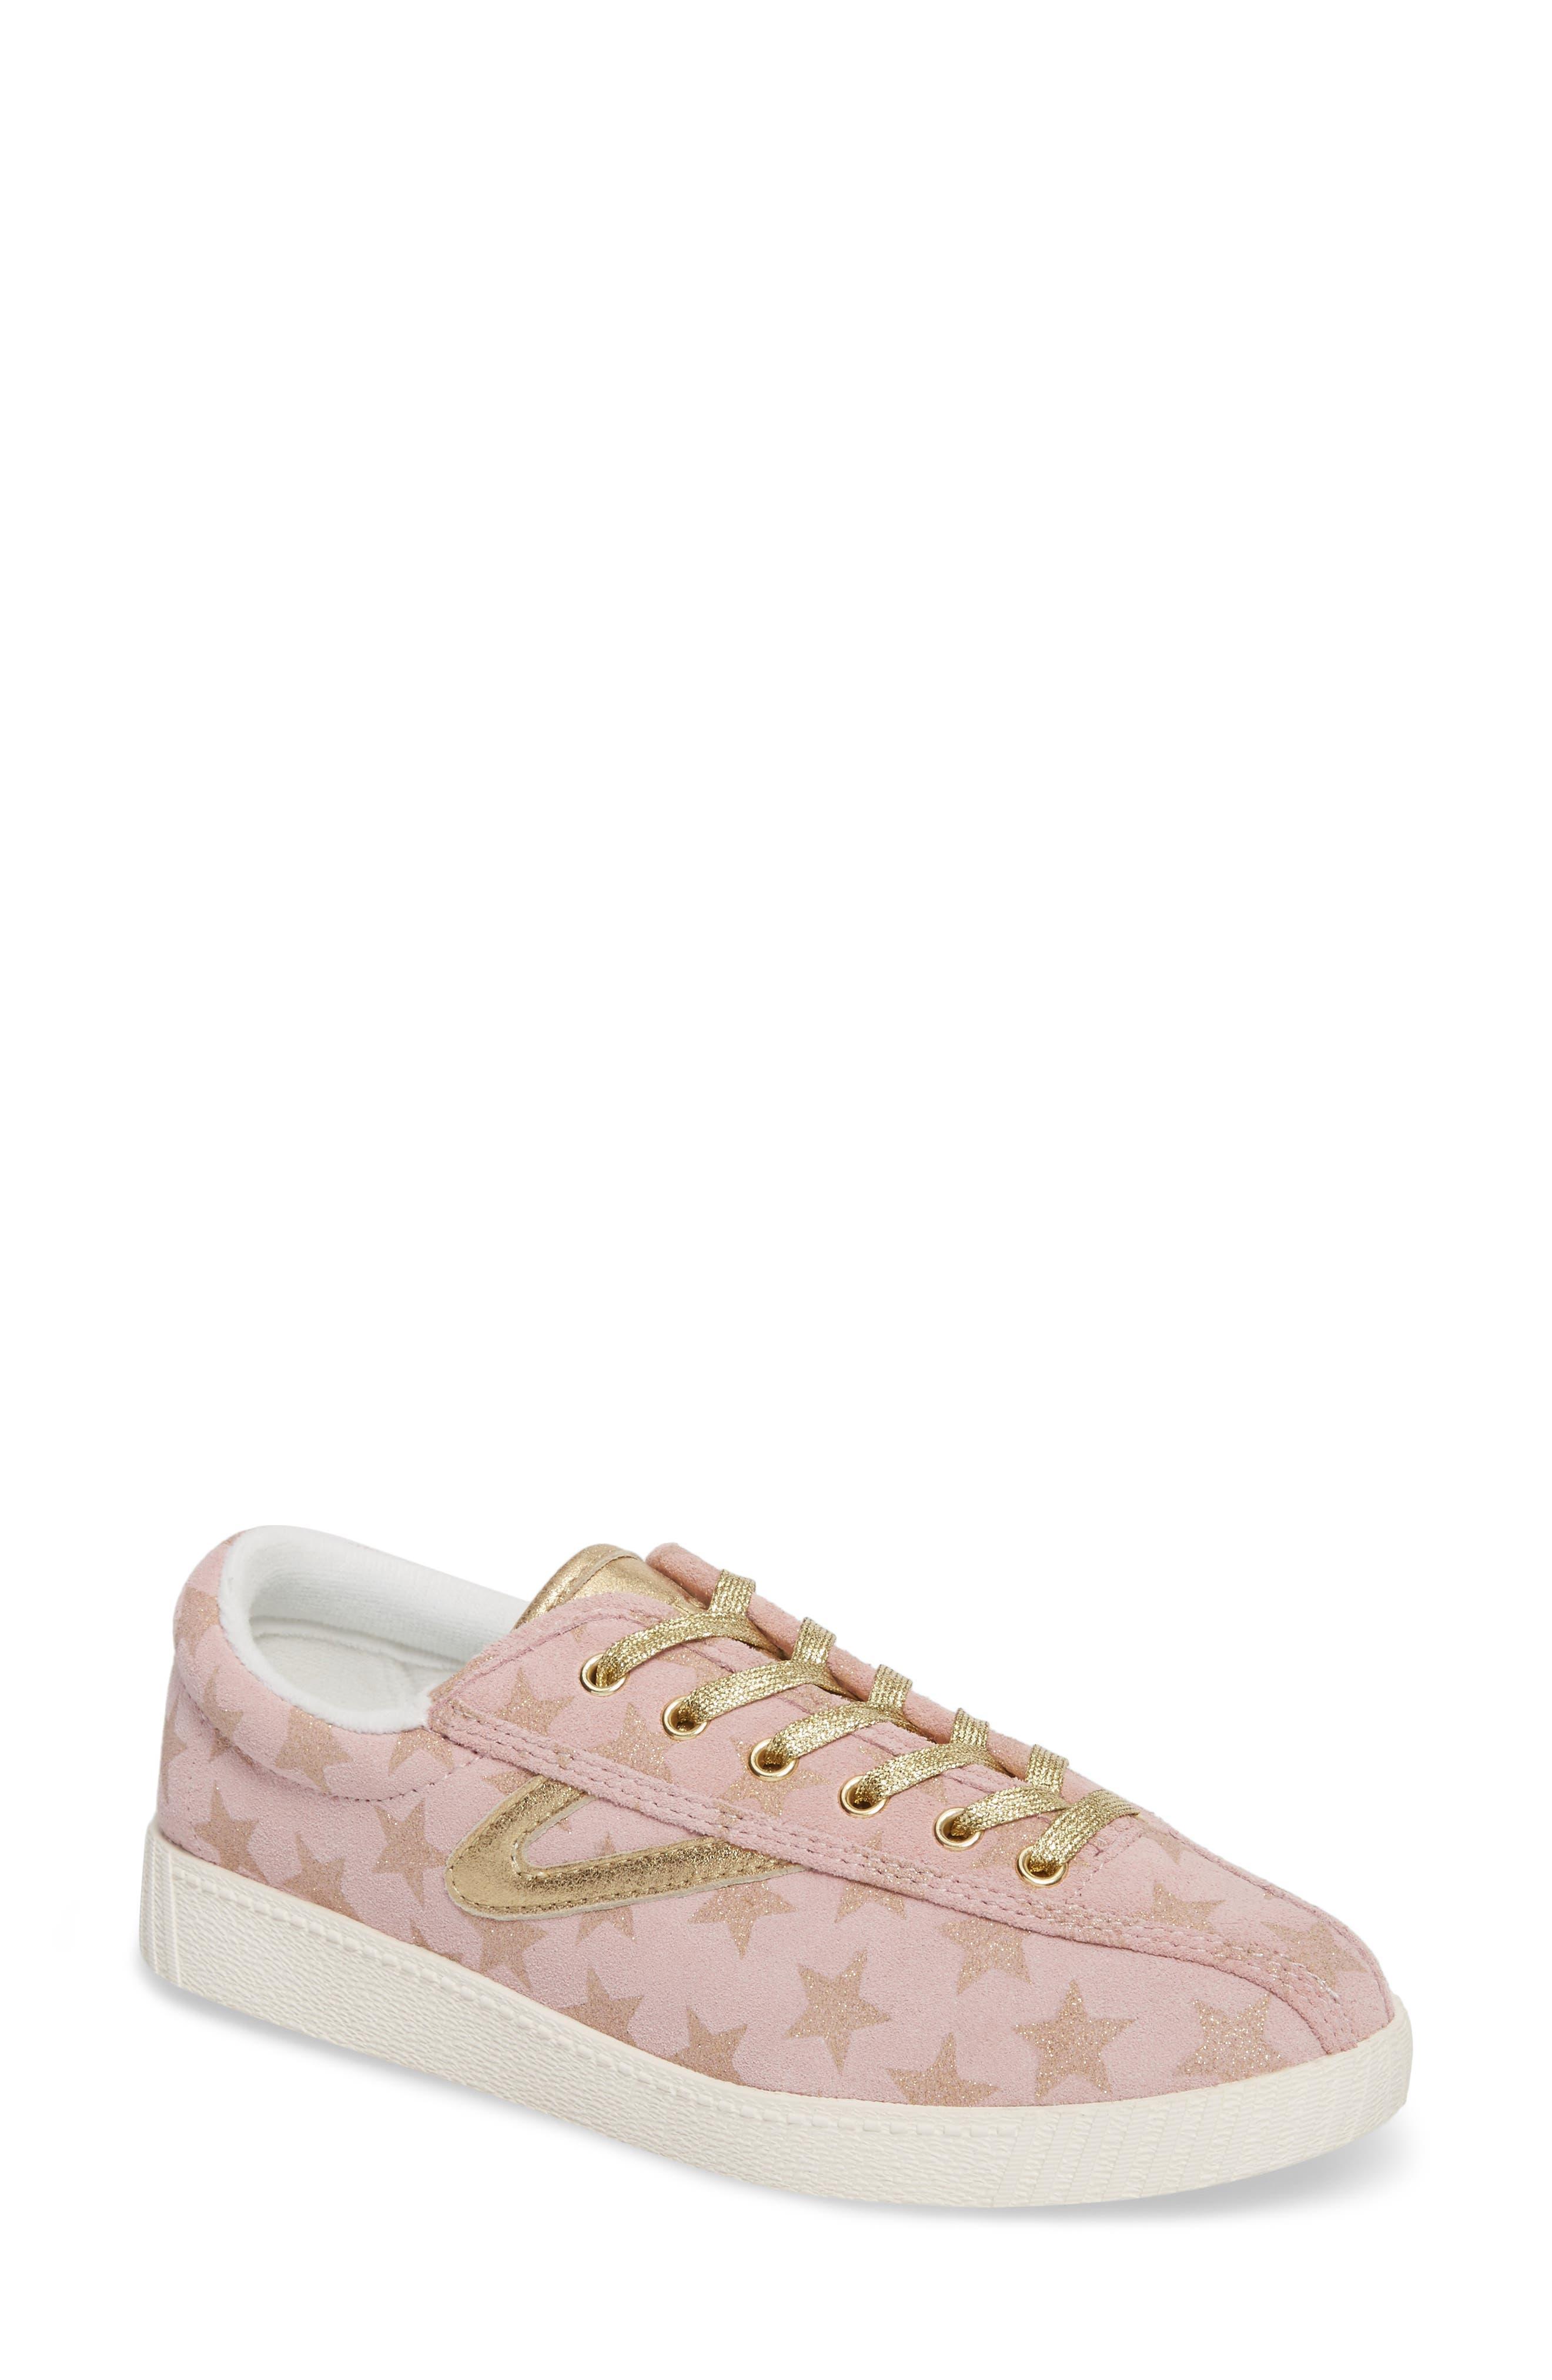 Tretorn Star Sneaker (Women)